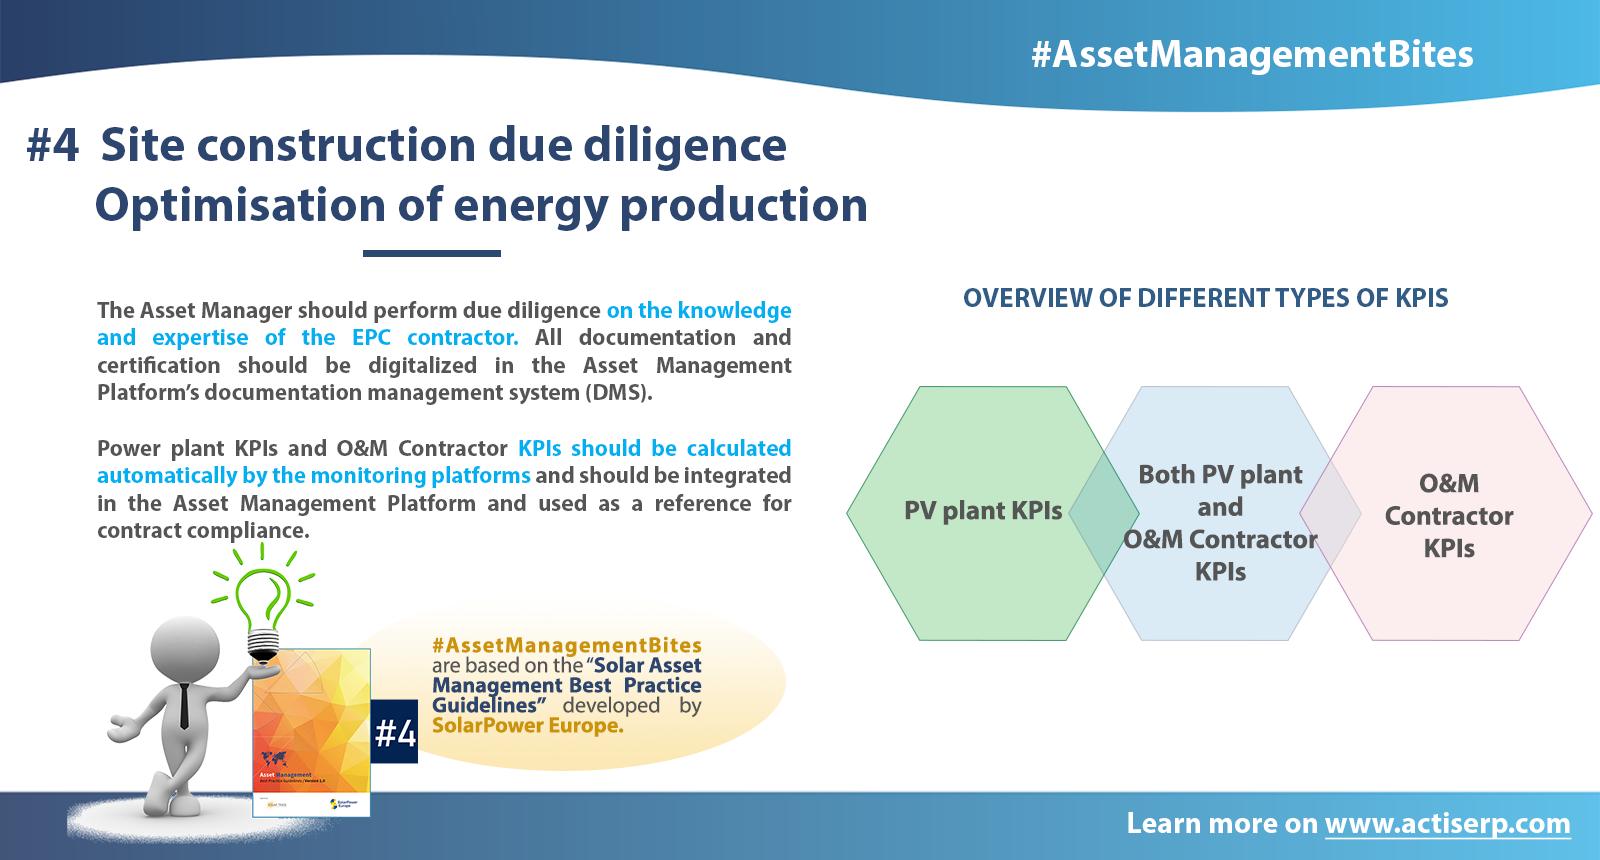 asset management bites site construction due diligence optimisation of energy production